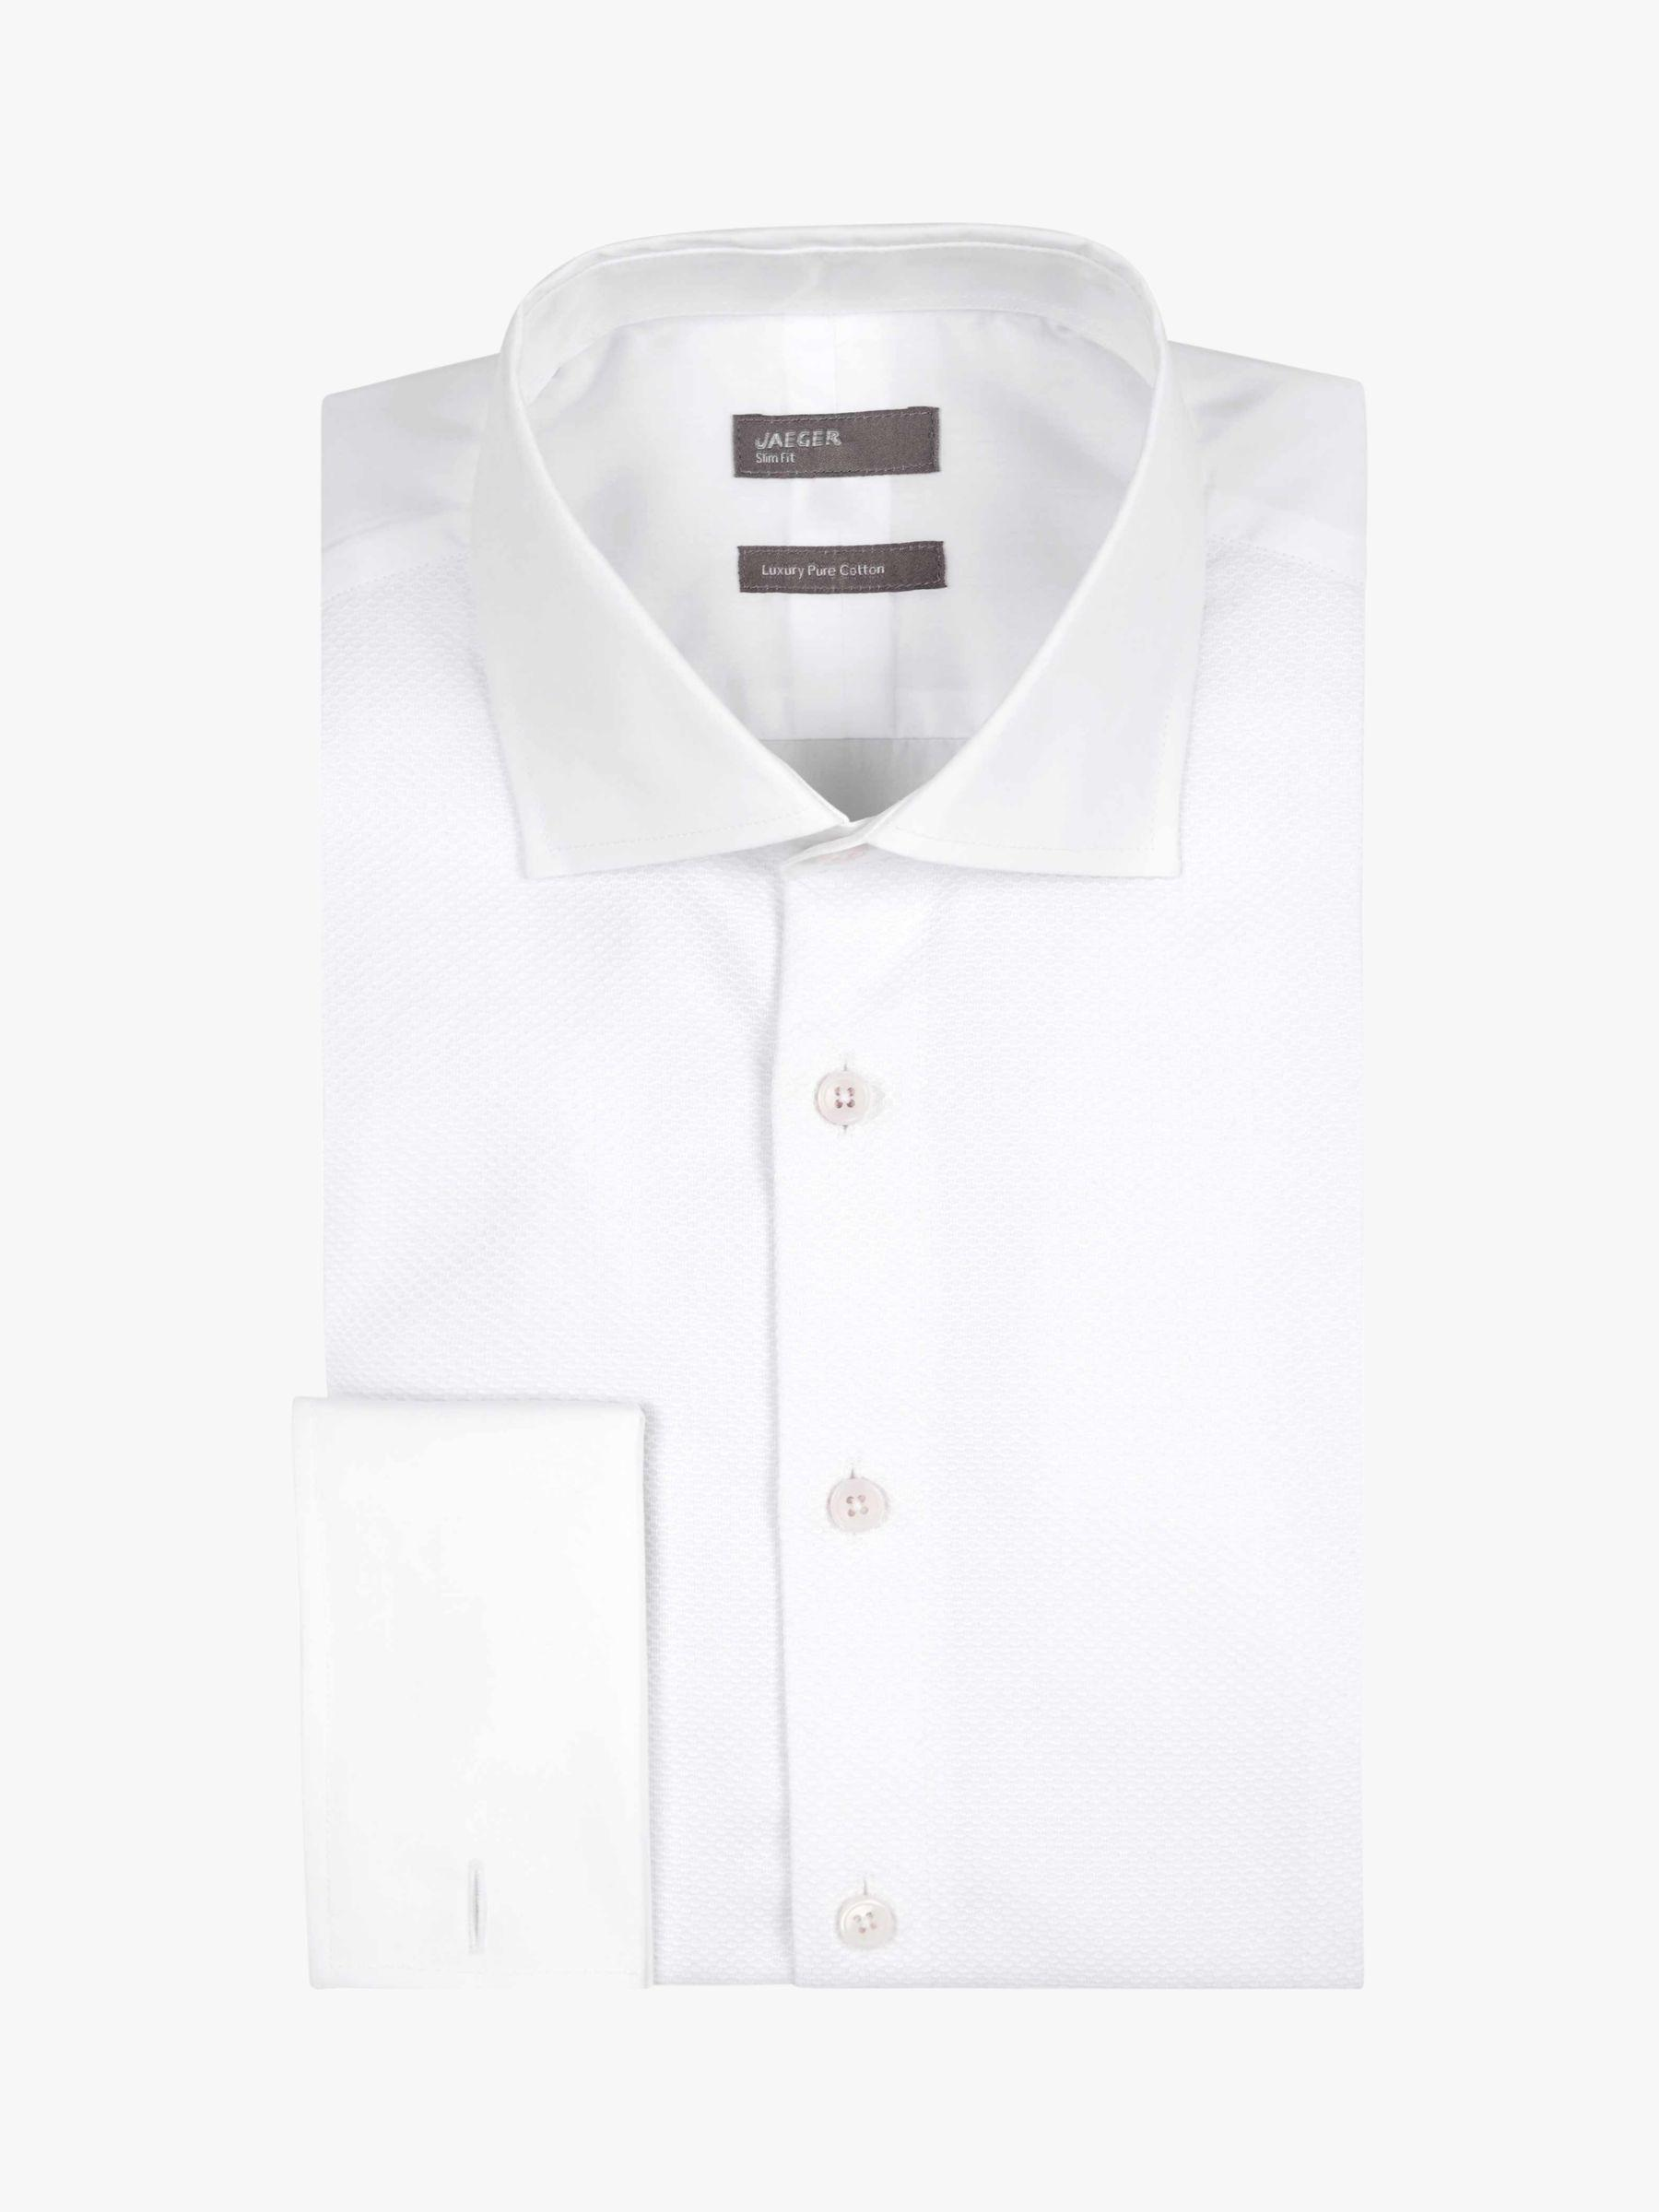 86ae5839bac Jaeger - White Marcella Formal Bib Shirt for Men - Lyst. View fullscreen